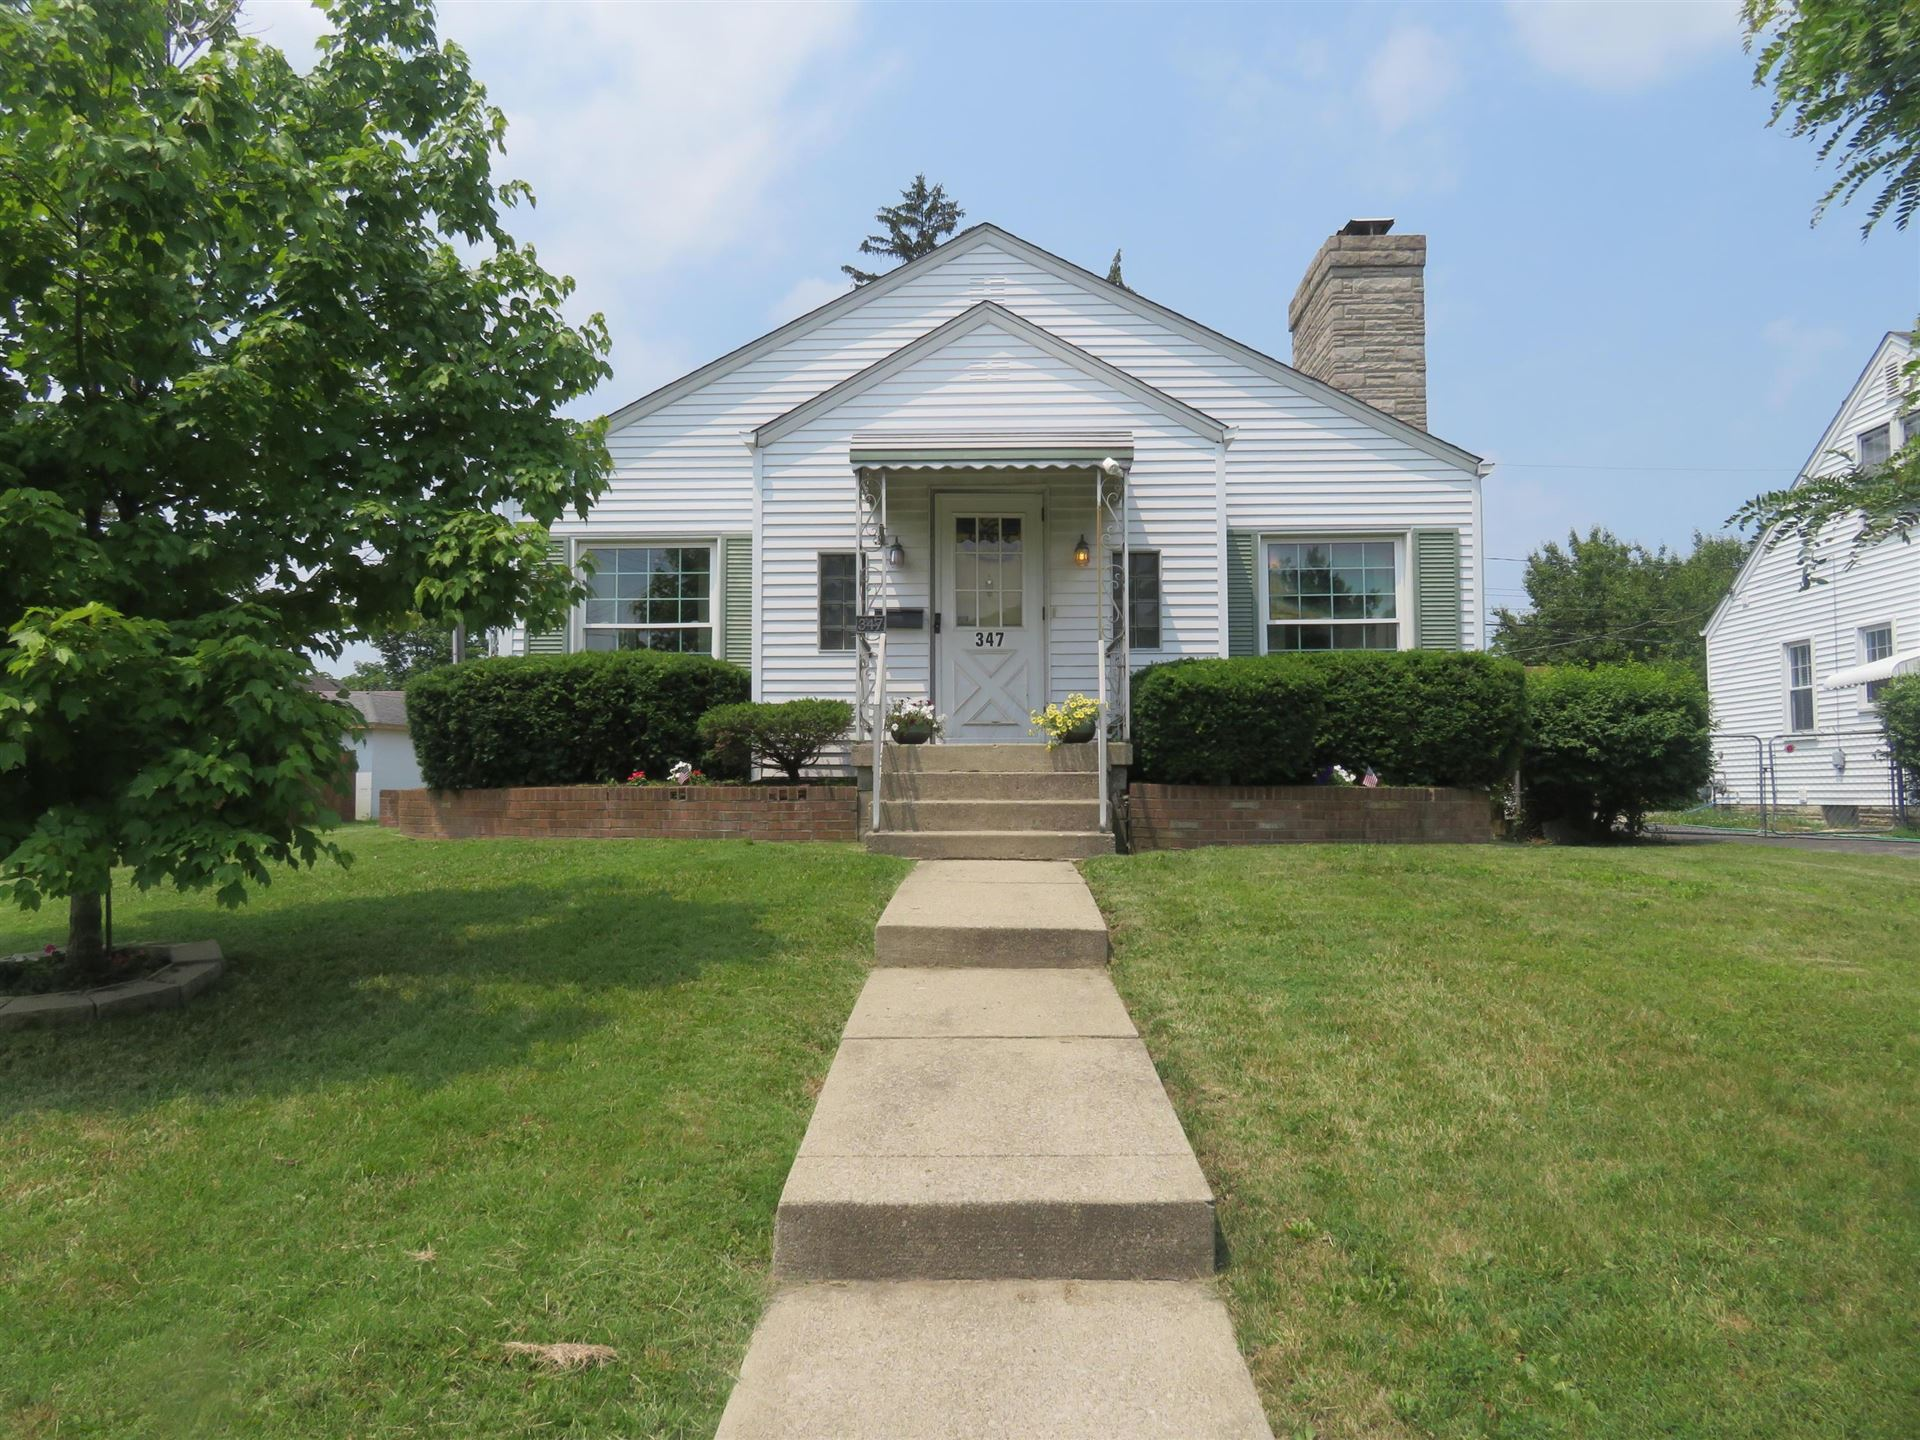 Photo for 347 Letchworth Avenue, Columbus, OH 43204 (MLS # 221020864)